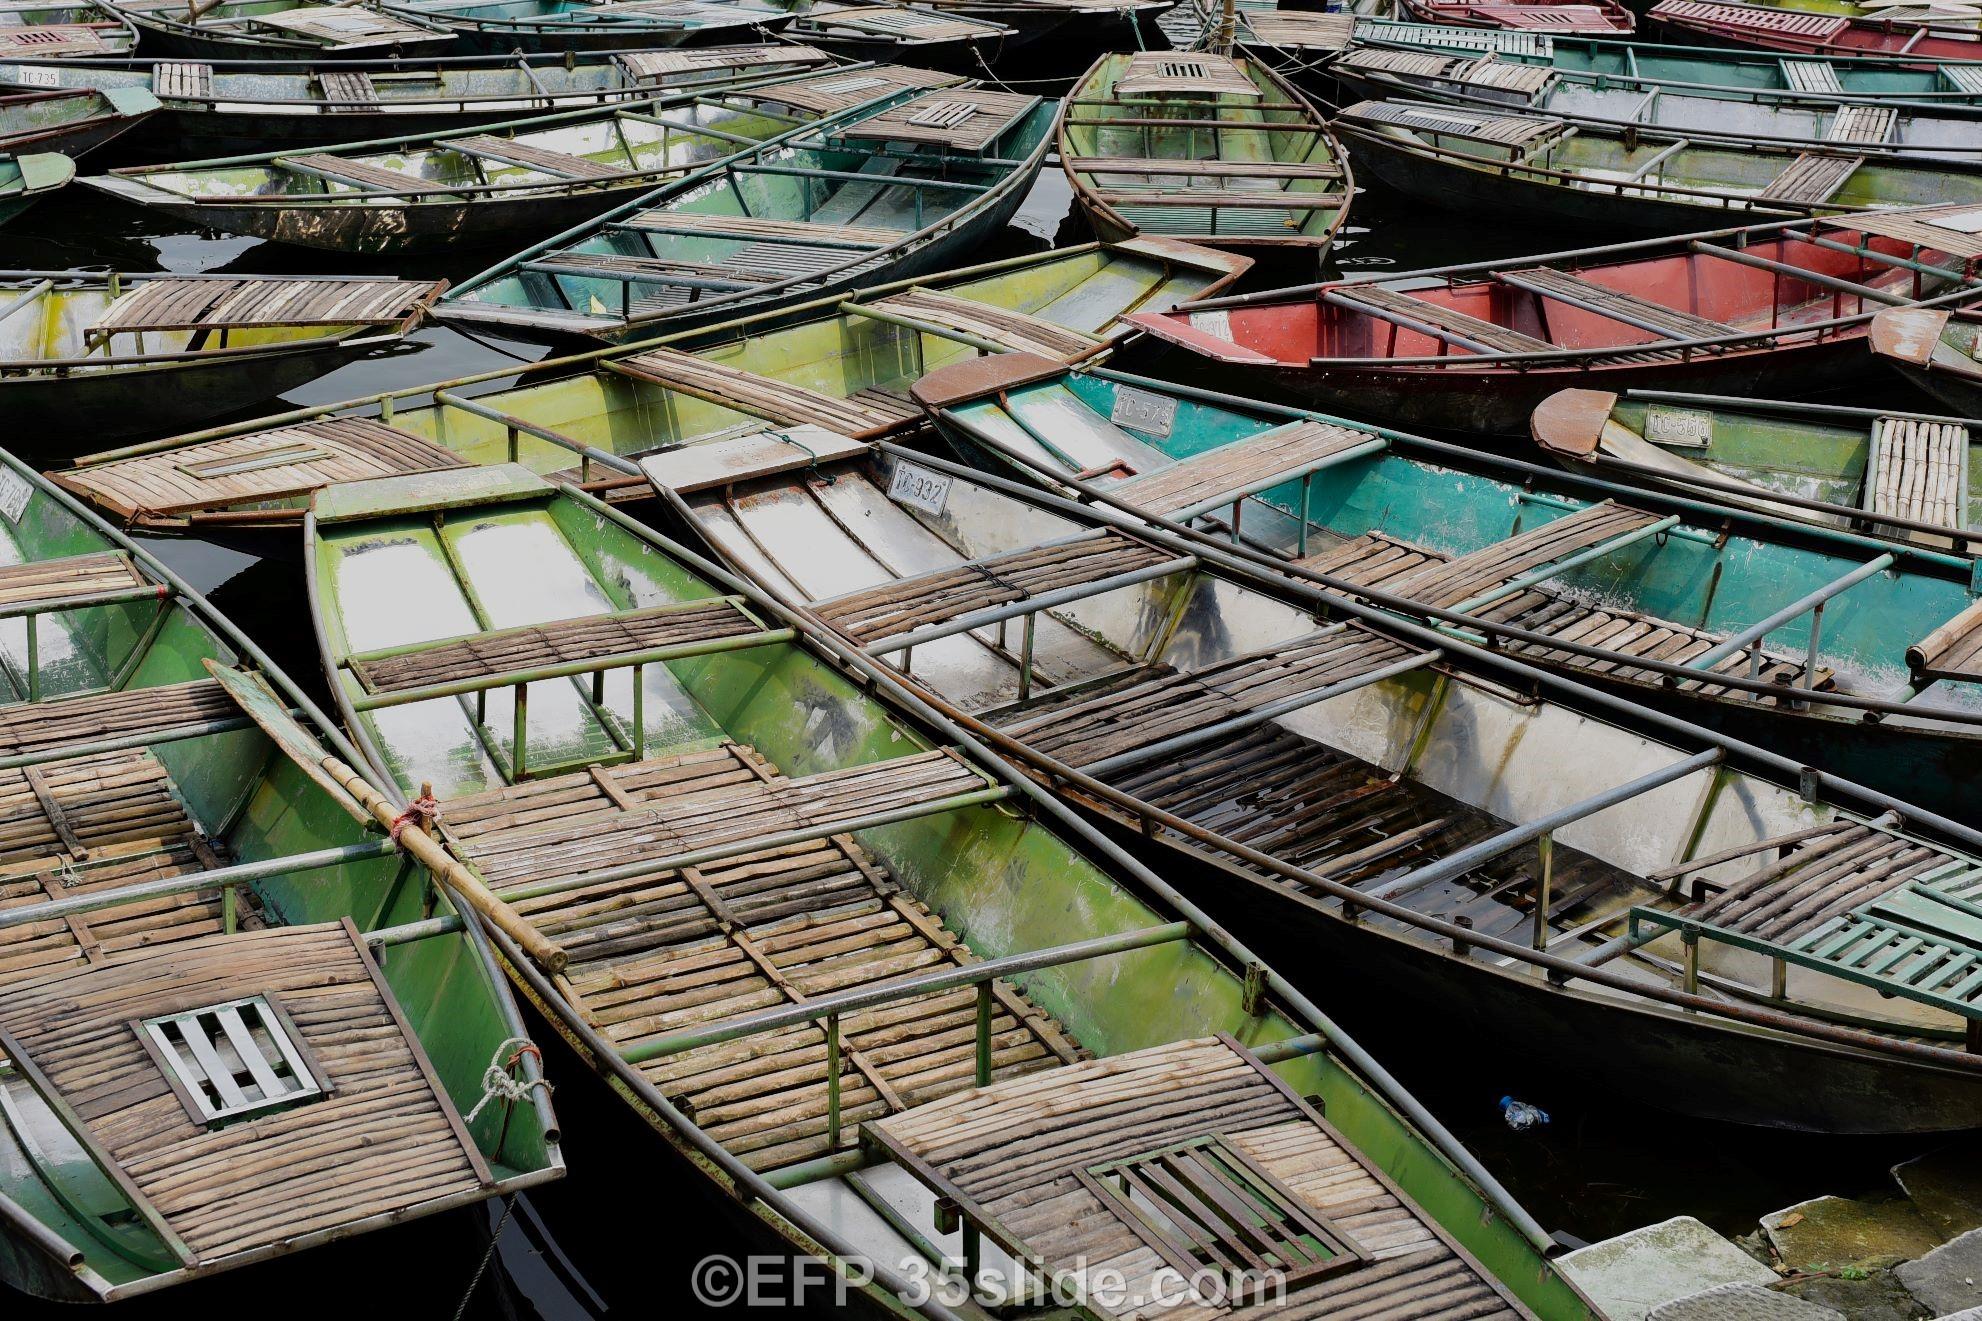 boats Ninh Binh.jpg